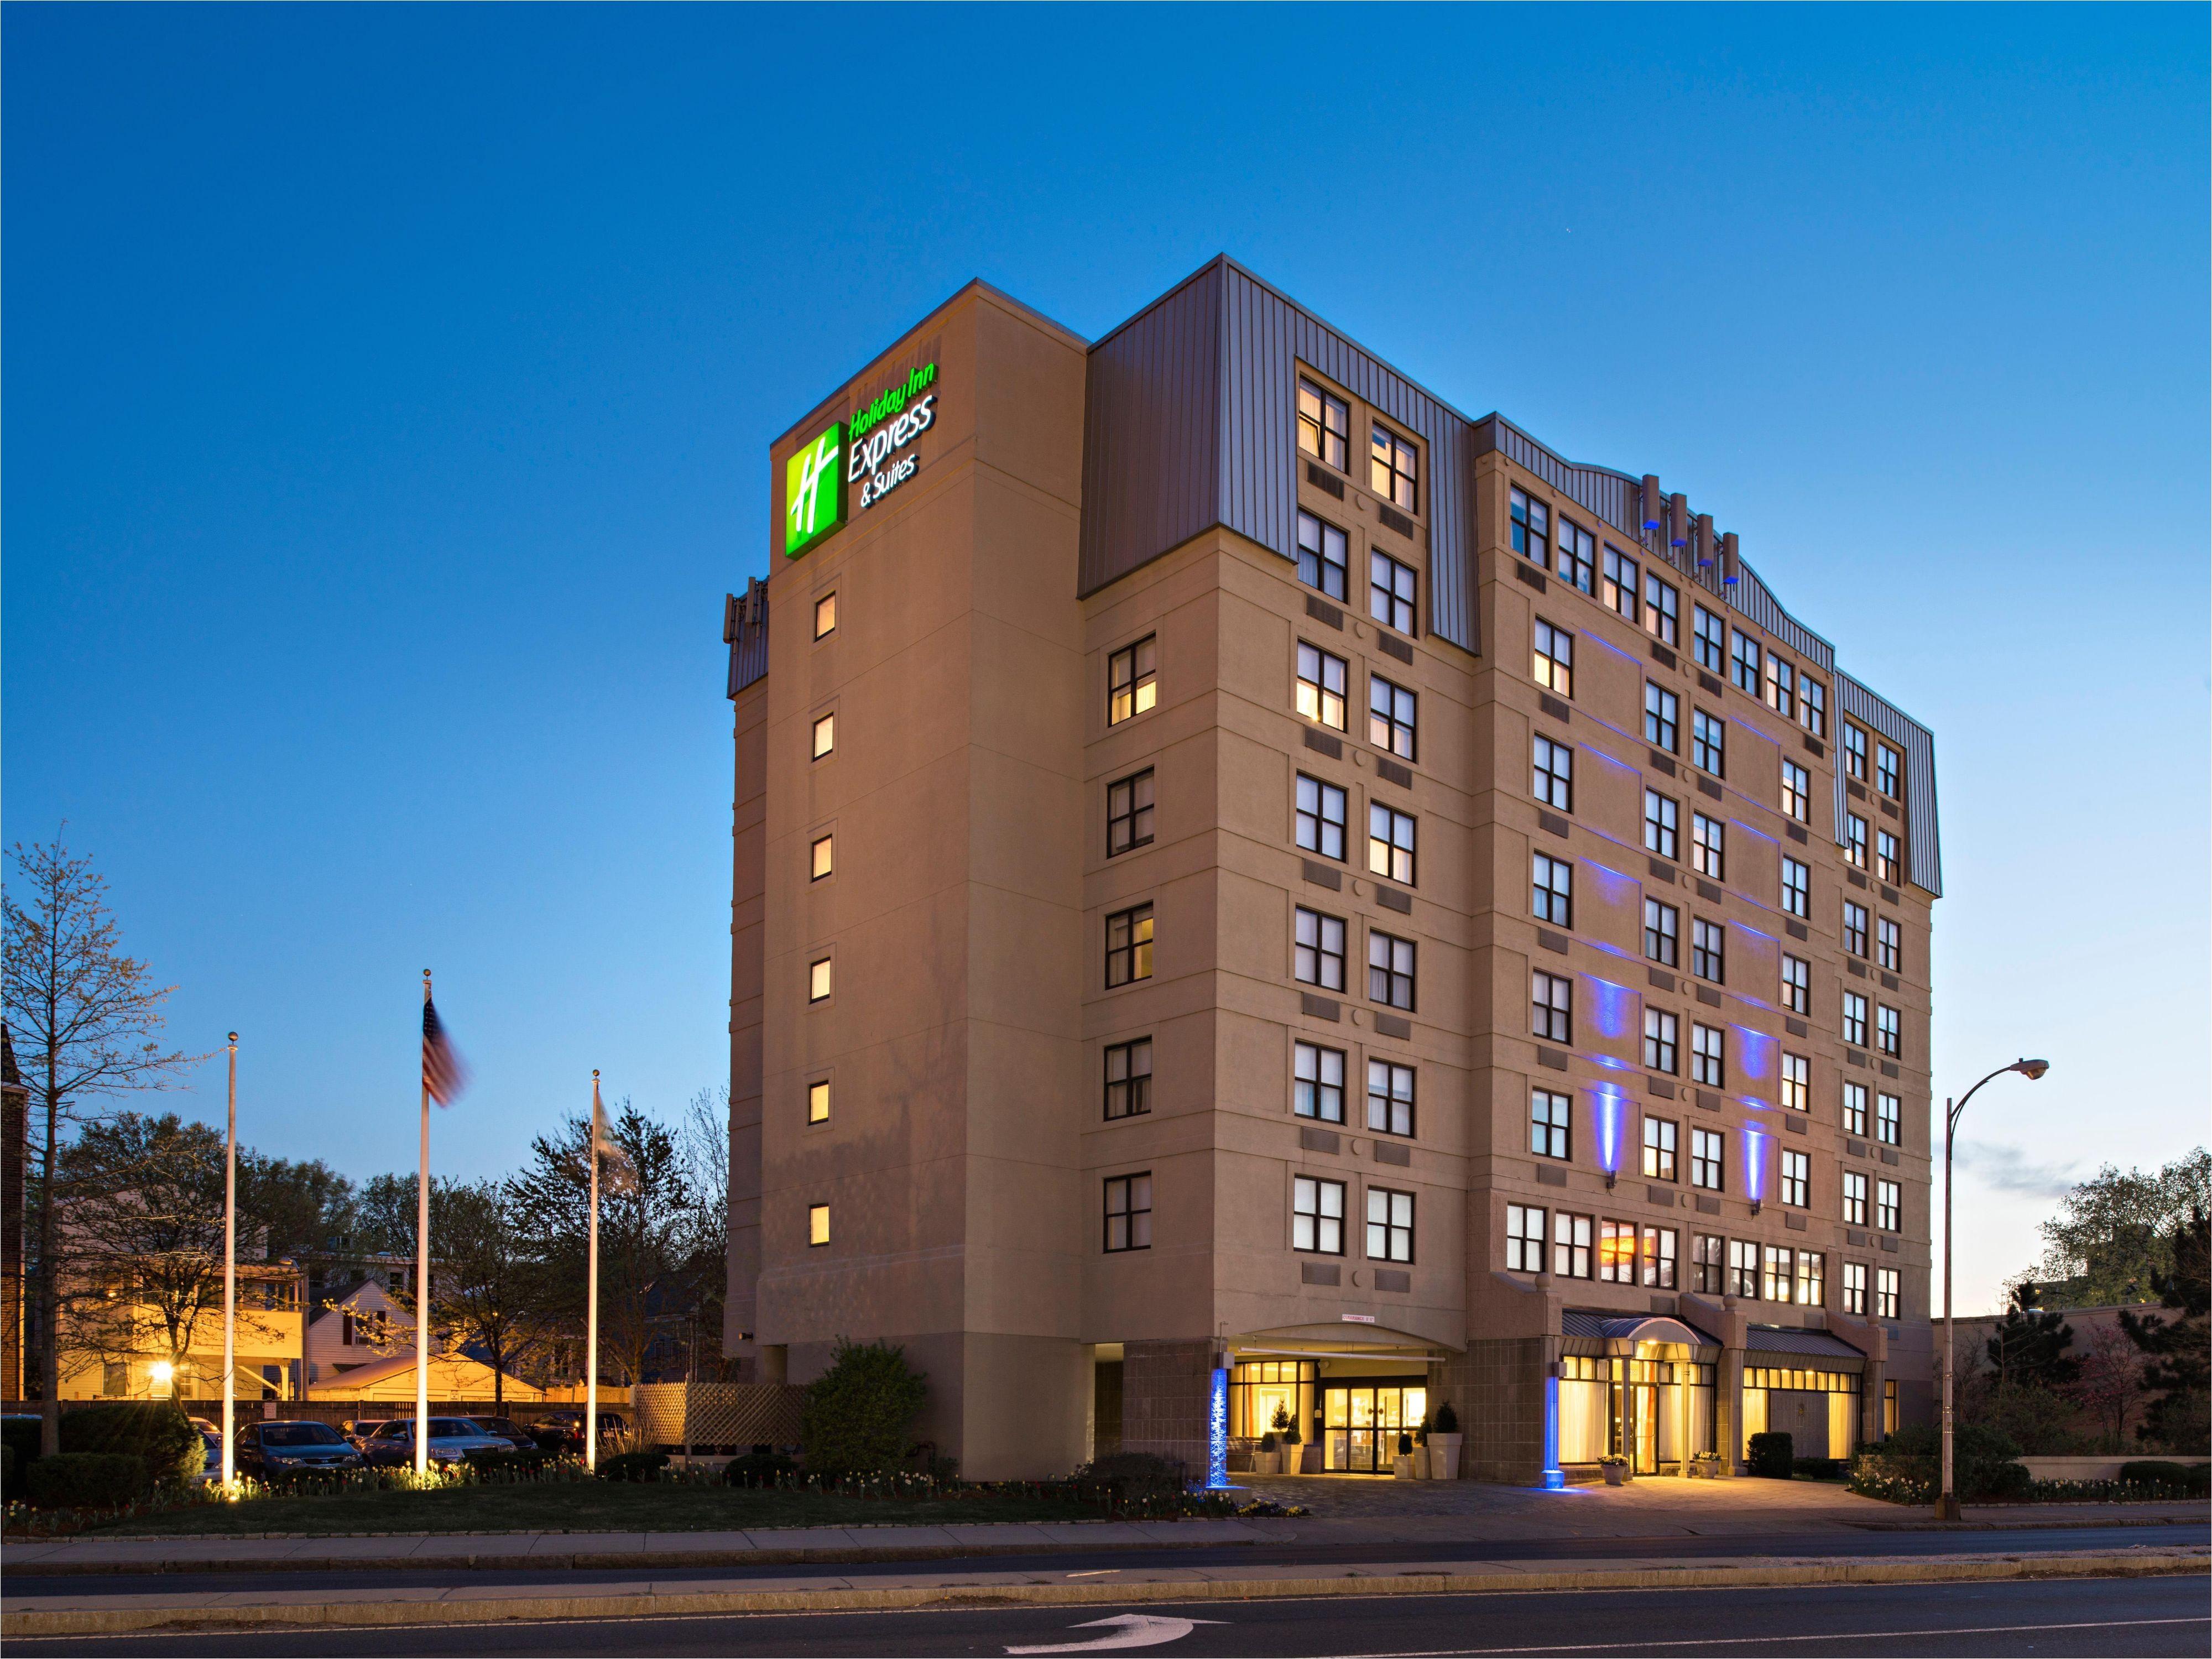 Hotels In Boston Near Td Garden Holiday Inn Express Suites Boston Cambridge Hotel by Ihg